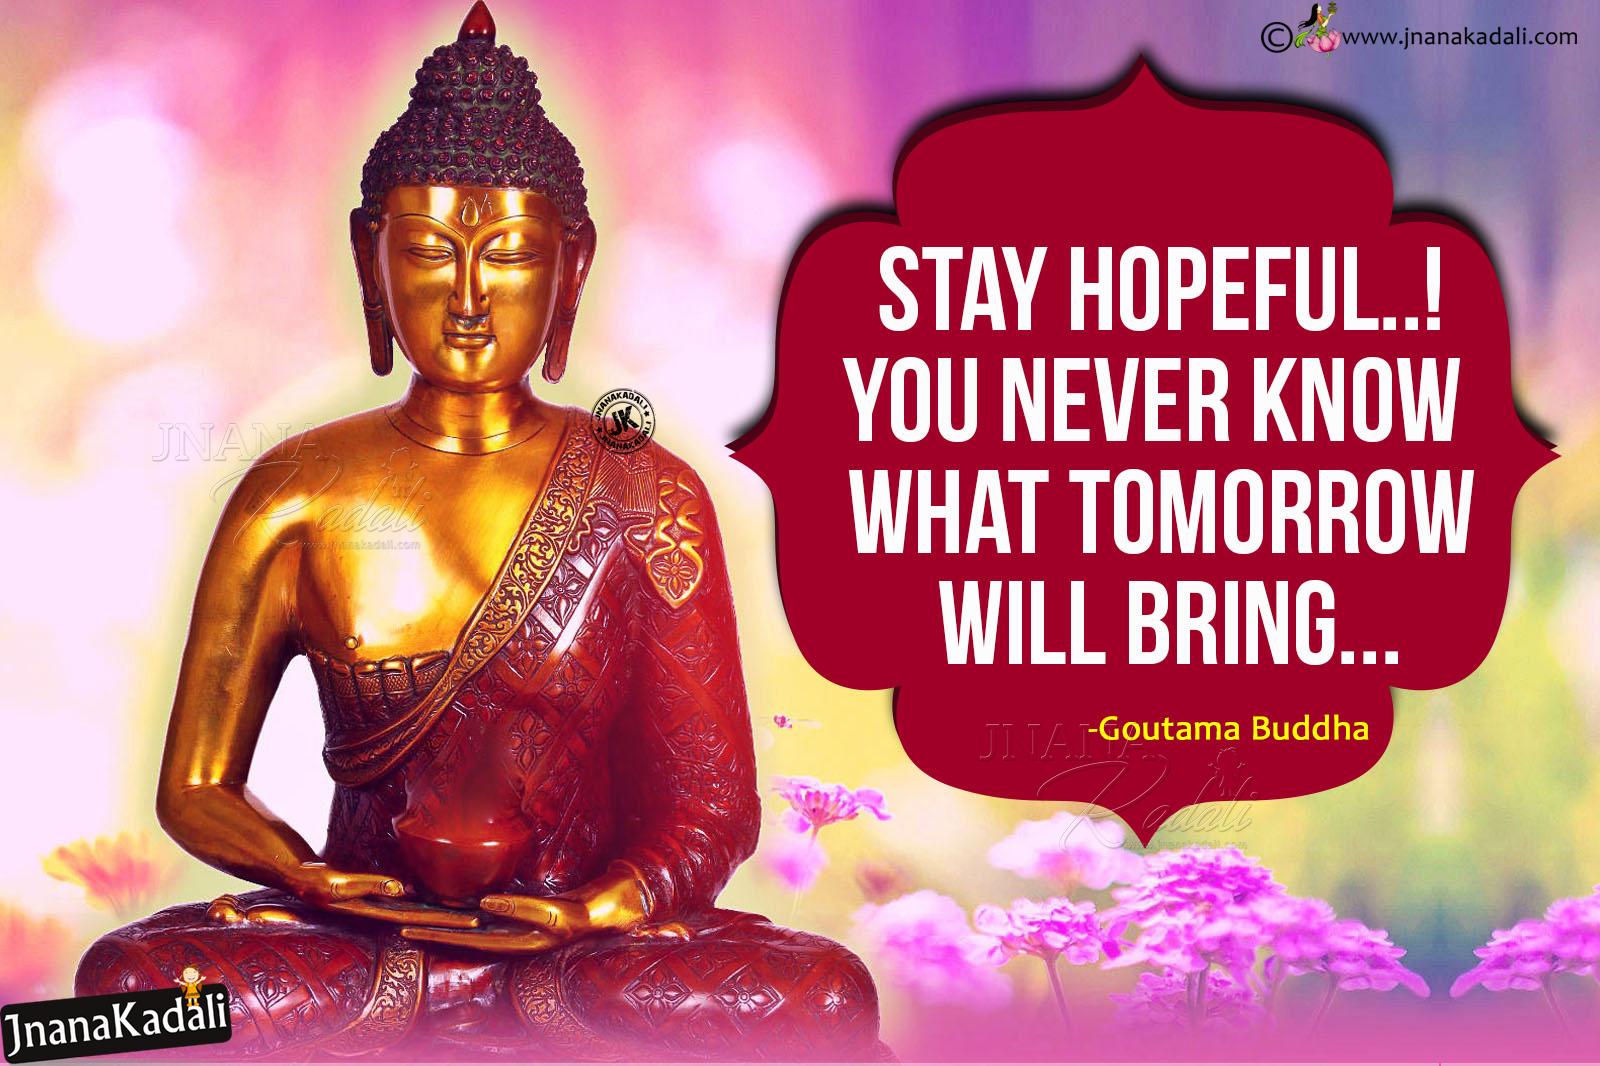 Be Confidence Quotes by Gautama Buddha in English-Motivational English Buddha Quotes   JNANA KADALI.COM  Telugu Quotes English quotes Hindi quotes ...